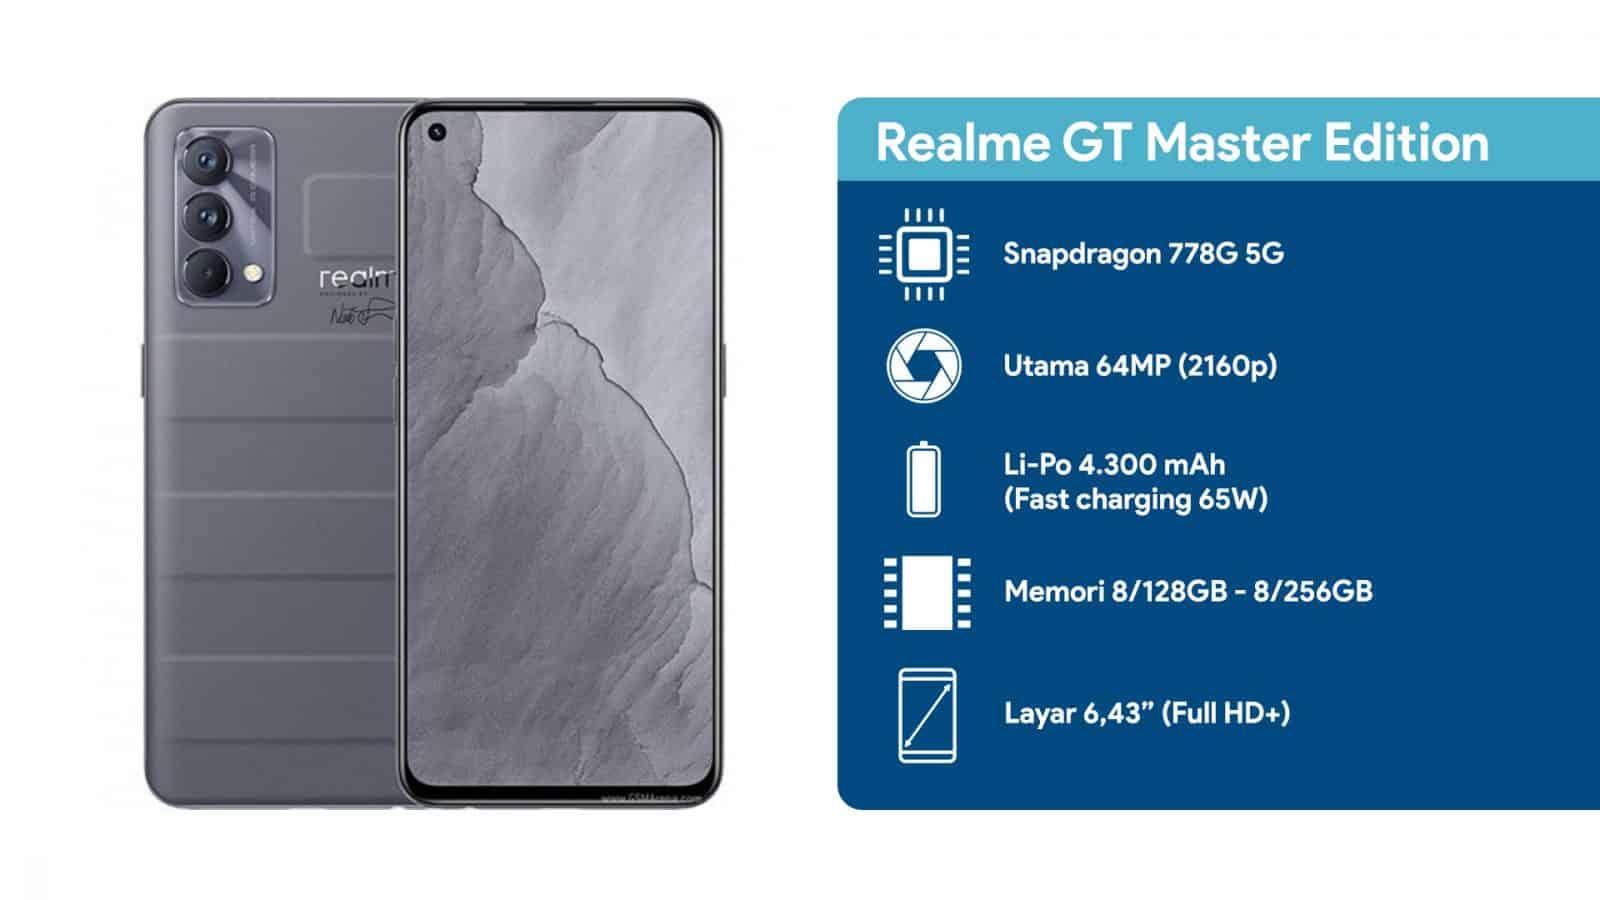 Spesifikasi Realme GT Master Edition